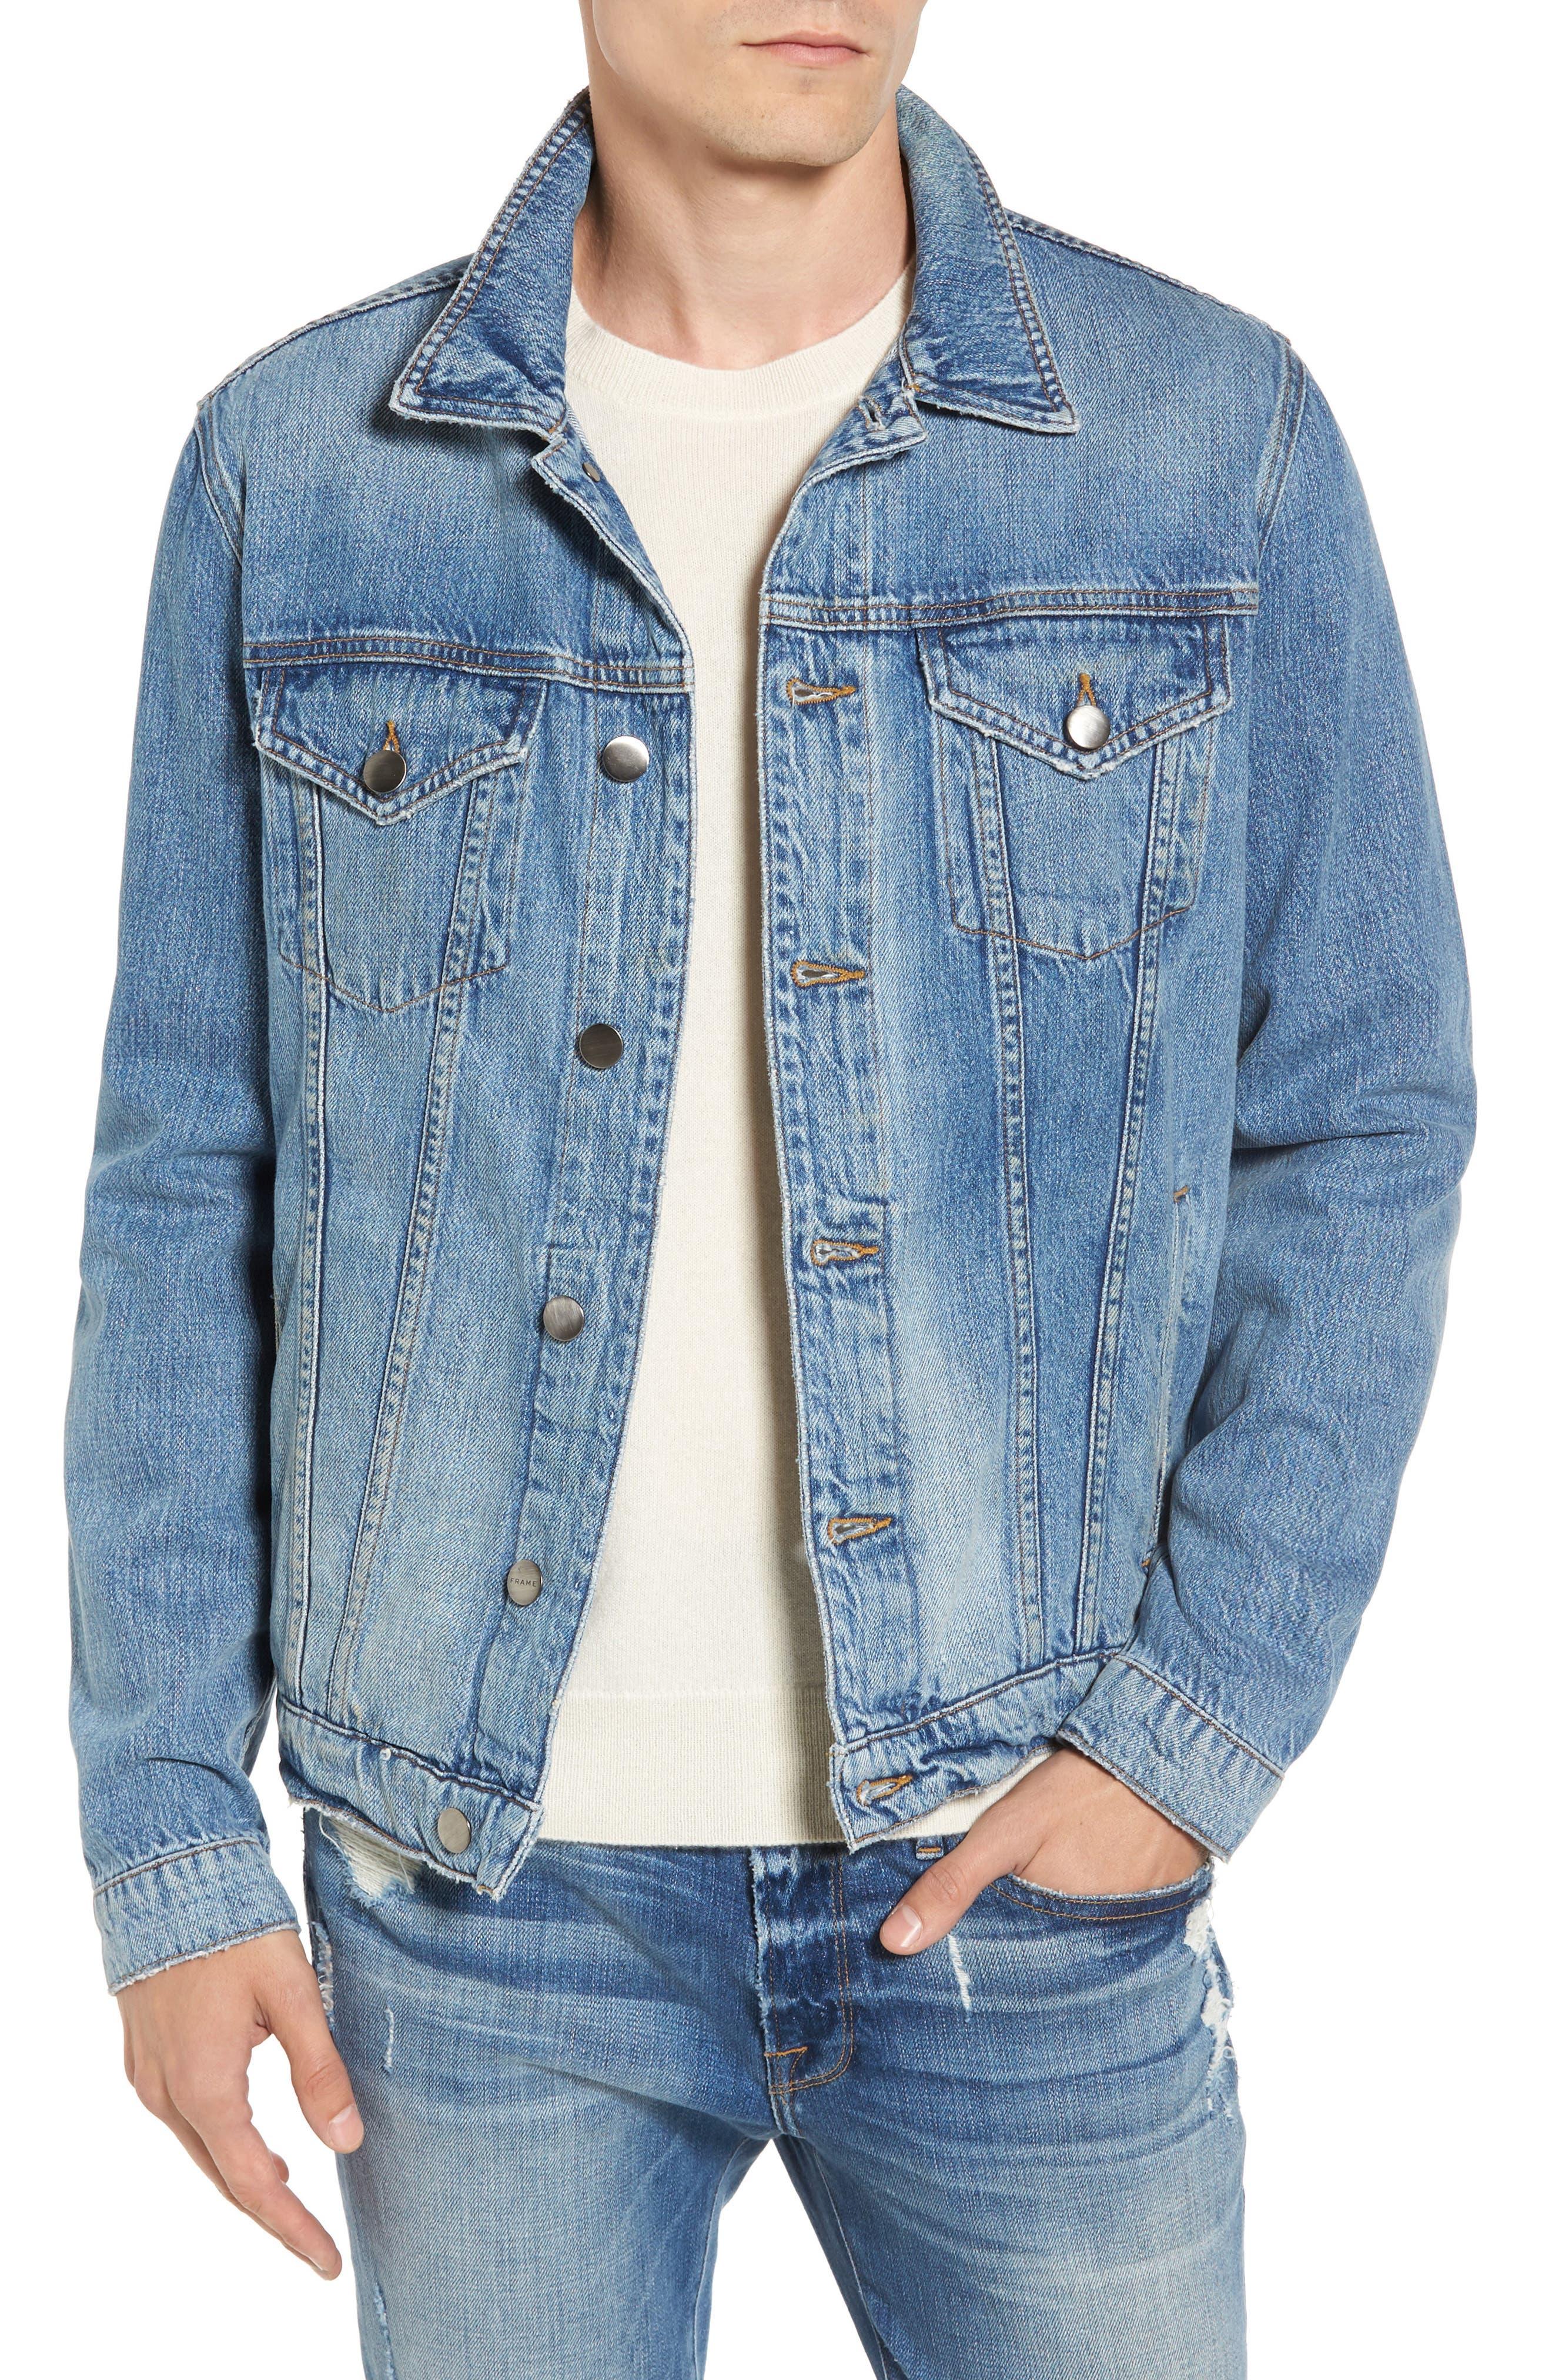 L'Homme Denim Jacket,                         Main,                         color, 450